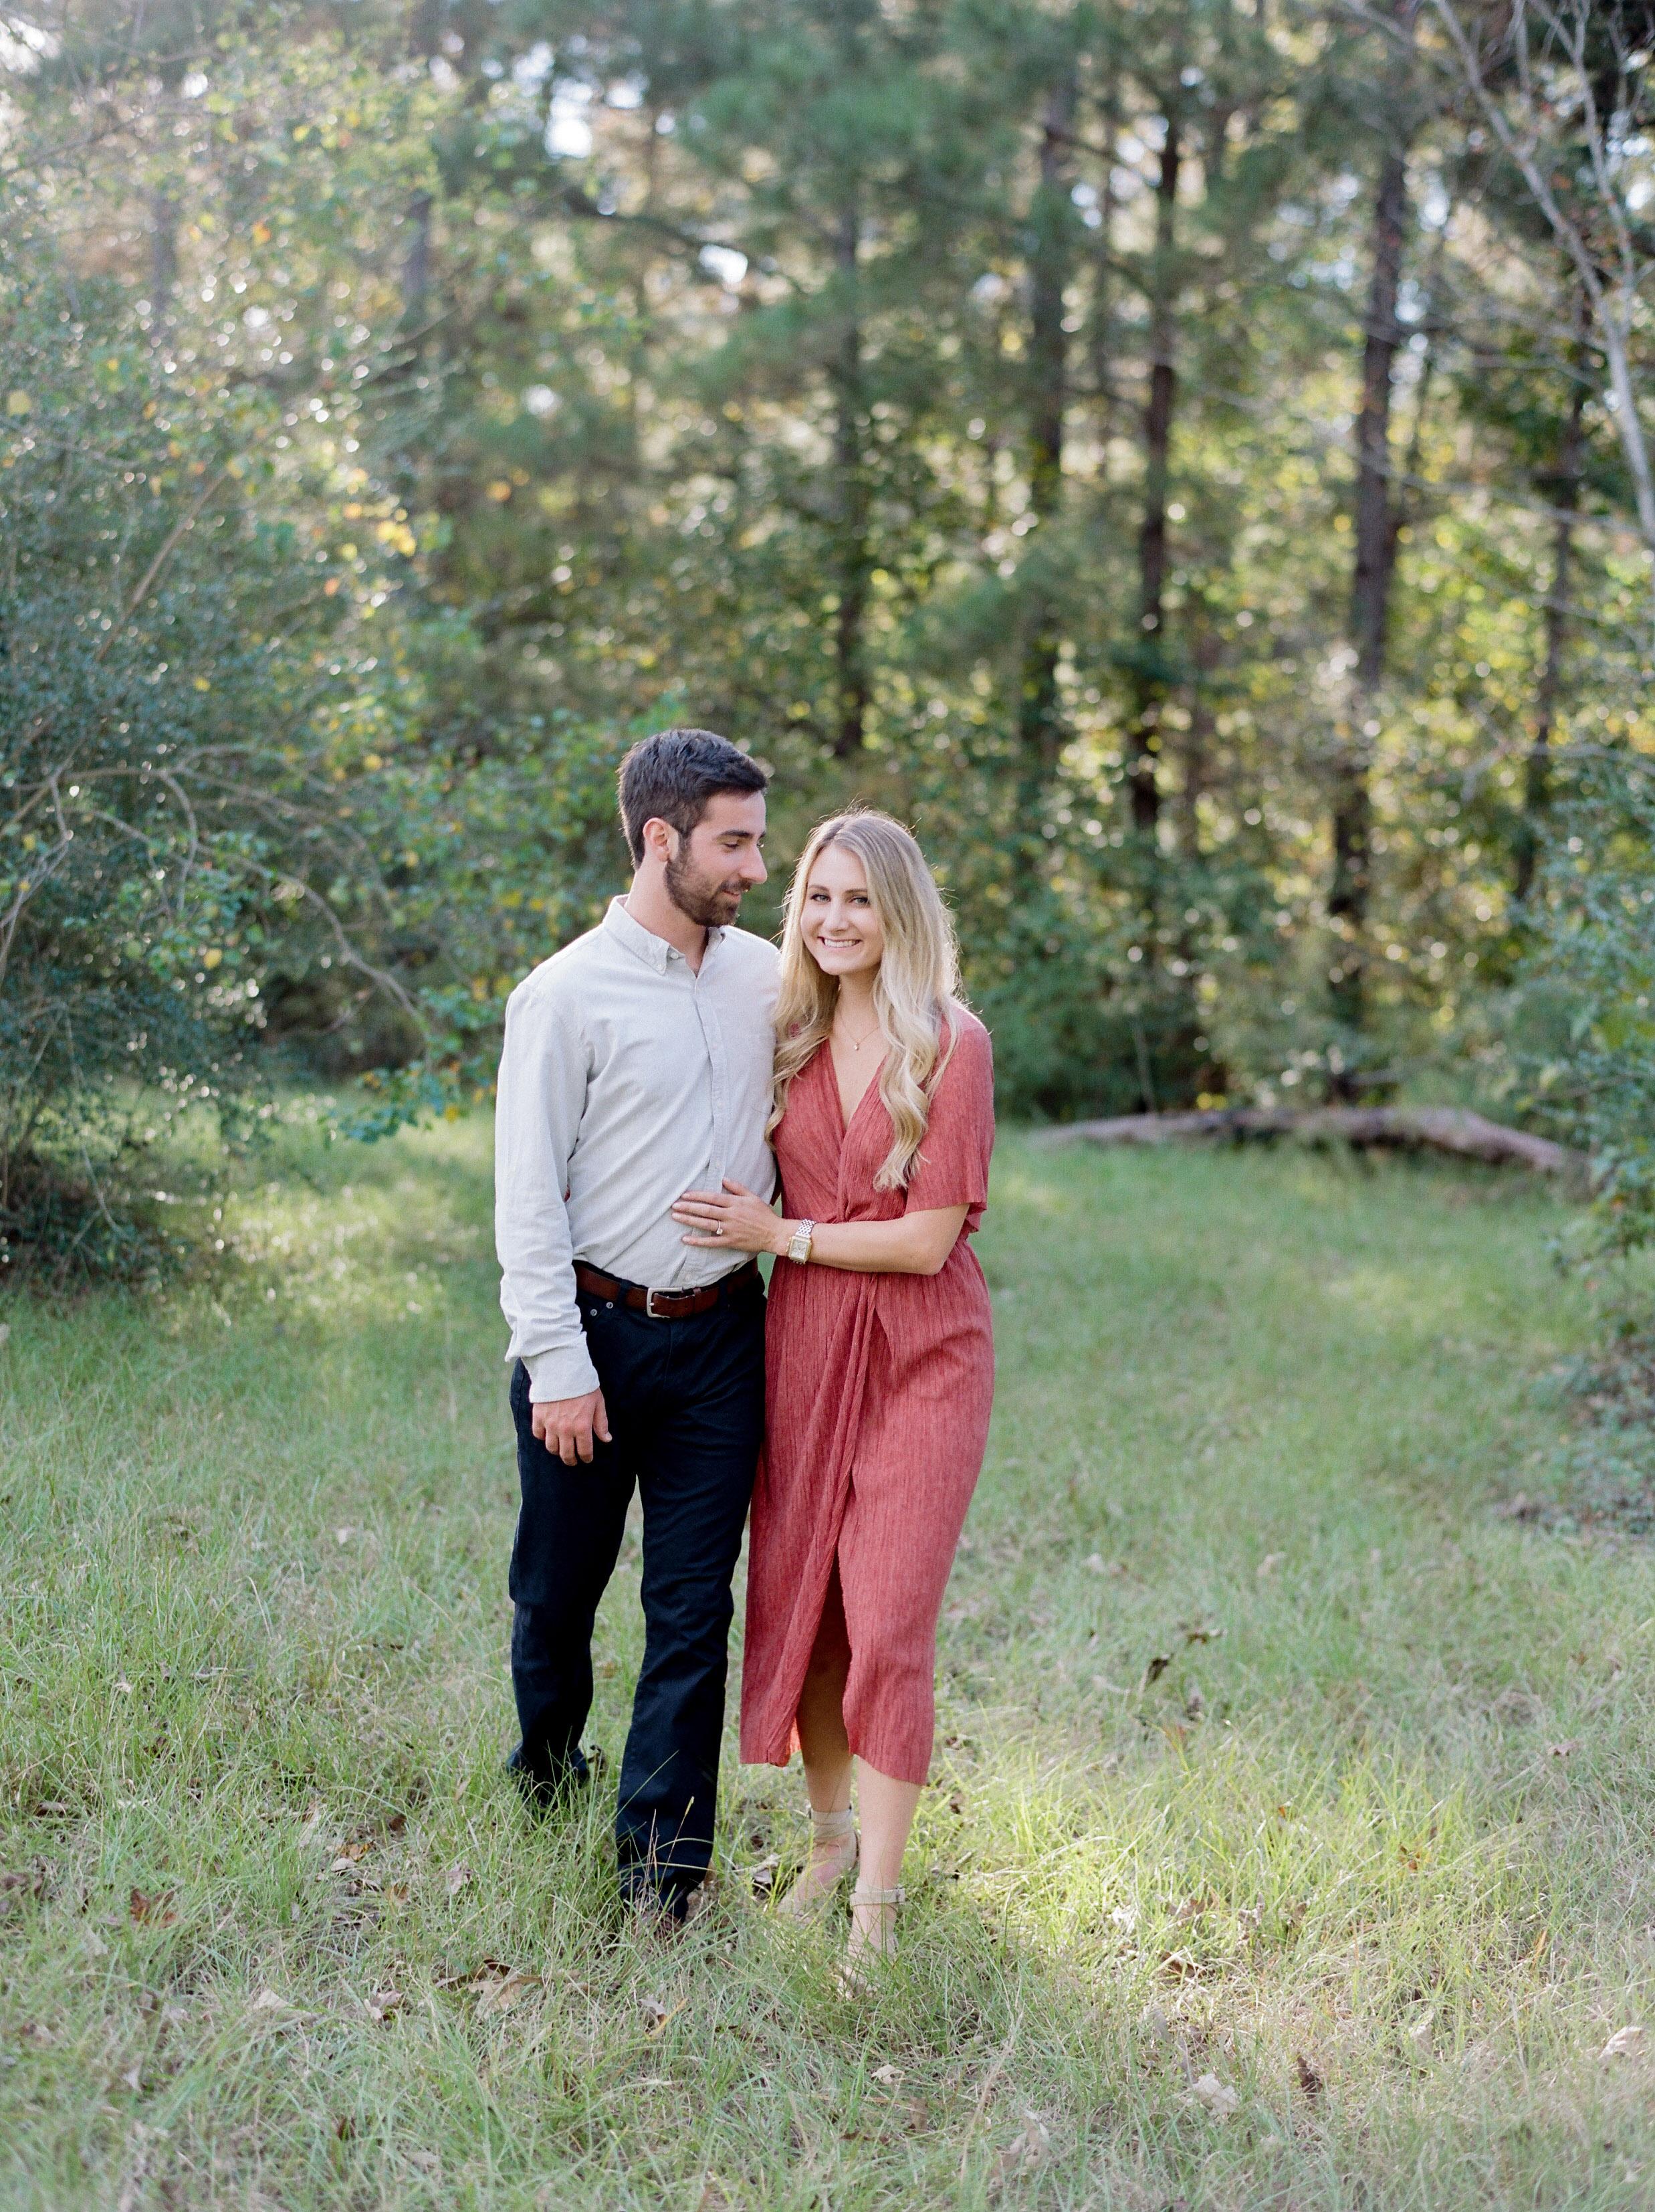 Houston-Wedding-Photographer-Best-Top-Luxury-Destination-Engagements-Portrait-Austin-Photography-8.jpg